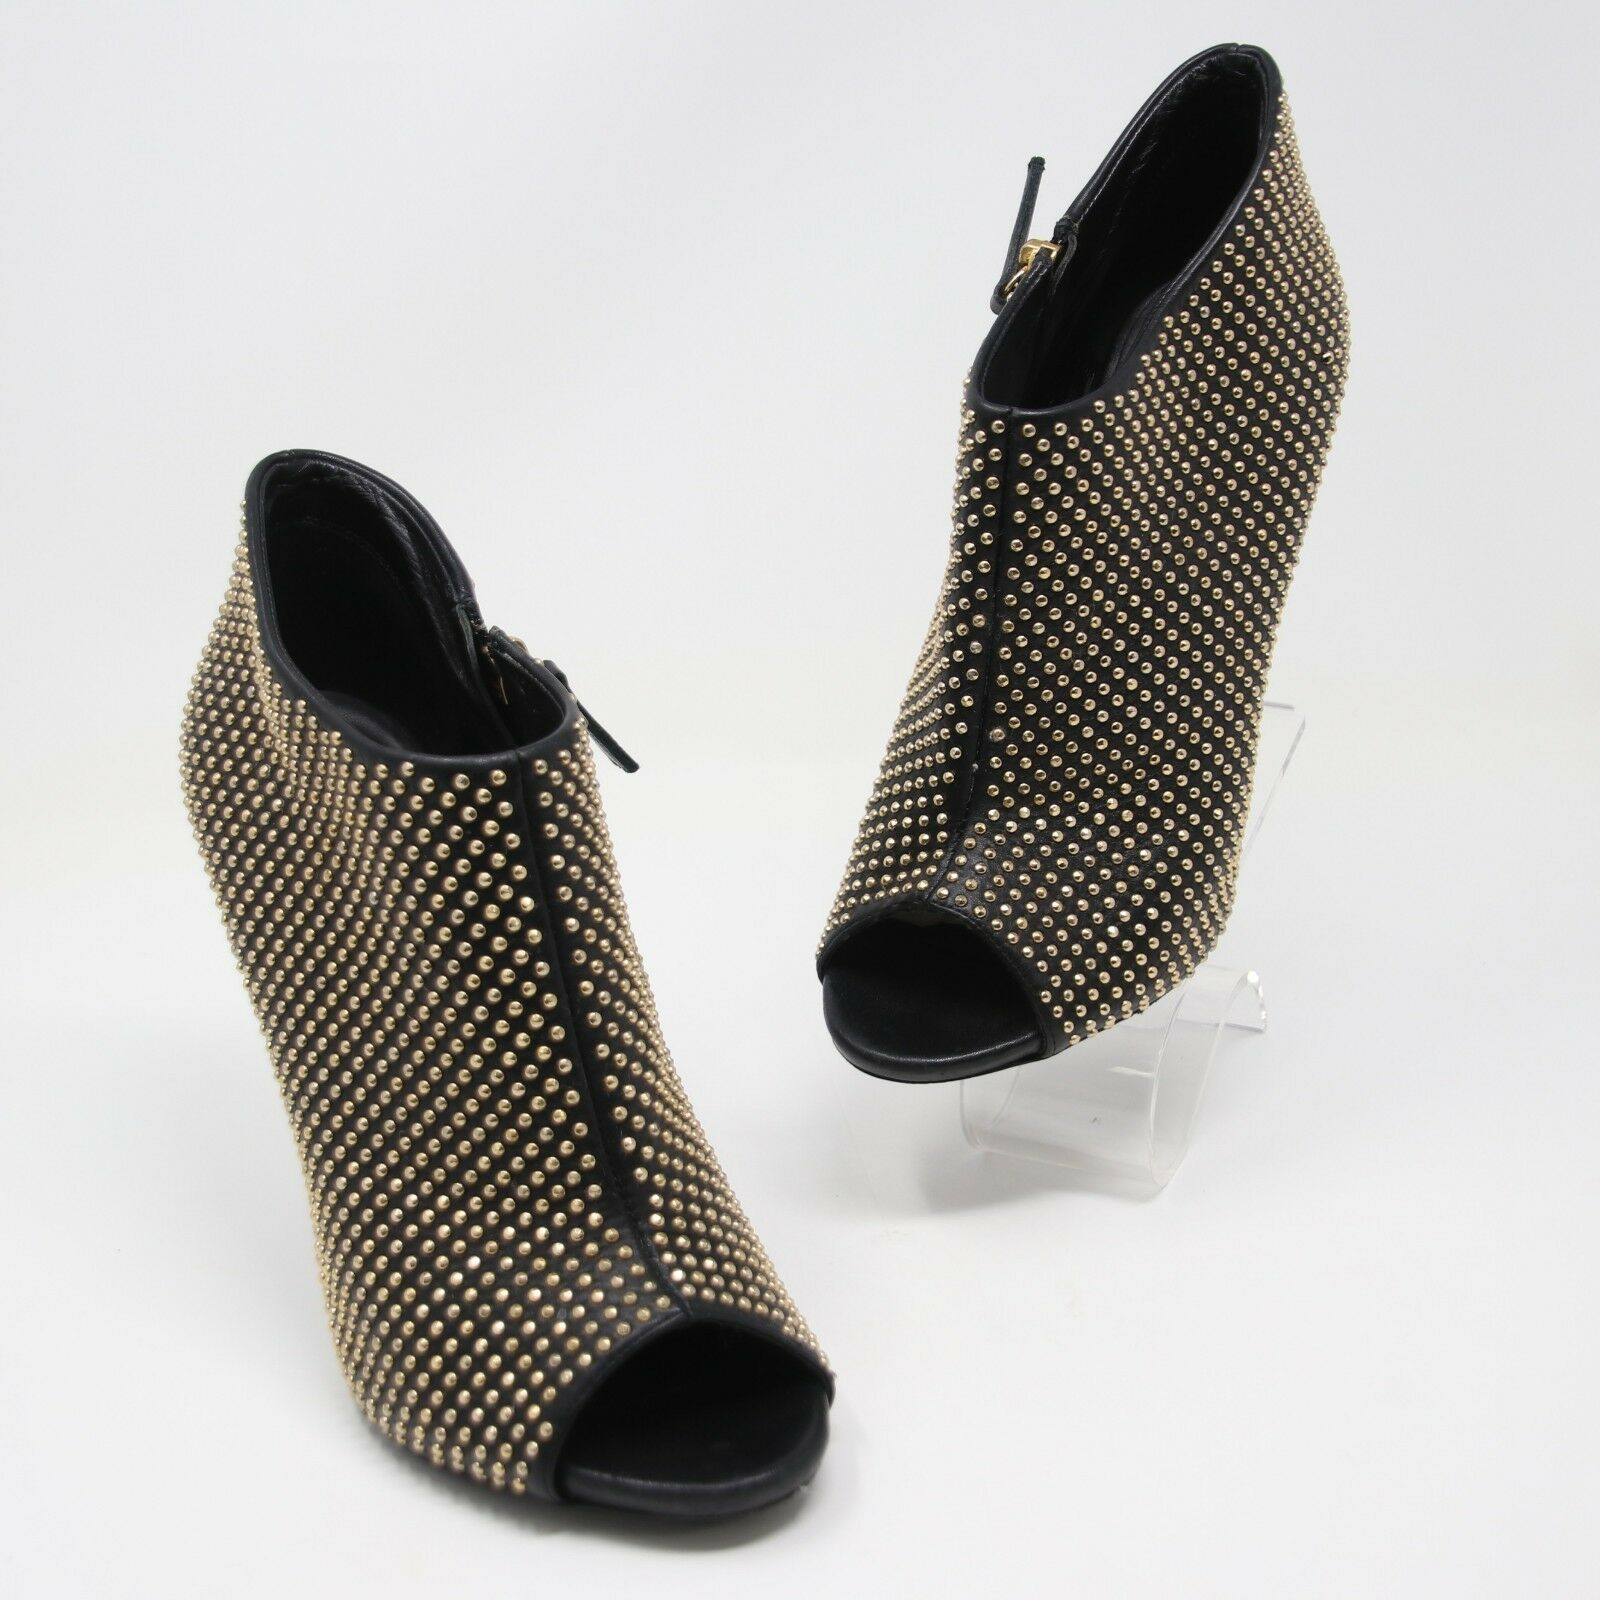 Giuseppe Zantotti Black Leather gold Studded Peep Toe Booties Sz 39.5